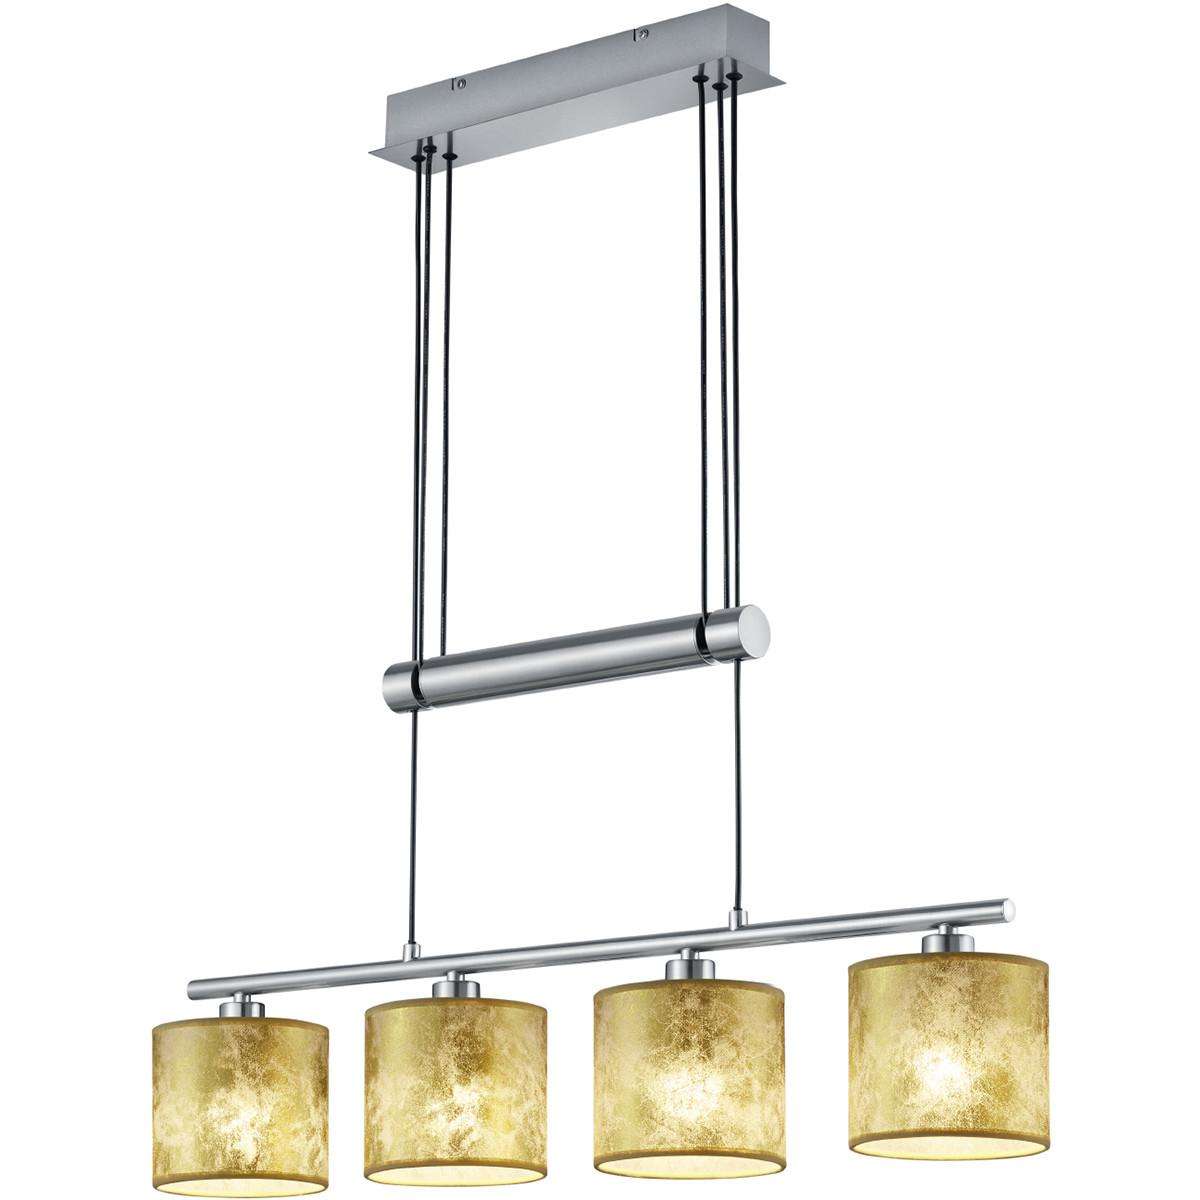 LED Hanglamp - Trion Gorino - E14 Fitting - 4-lichts - Rechthoek - Mat Goud - Aluminium